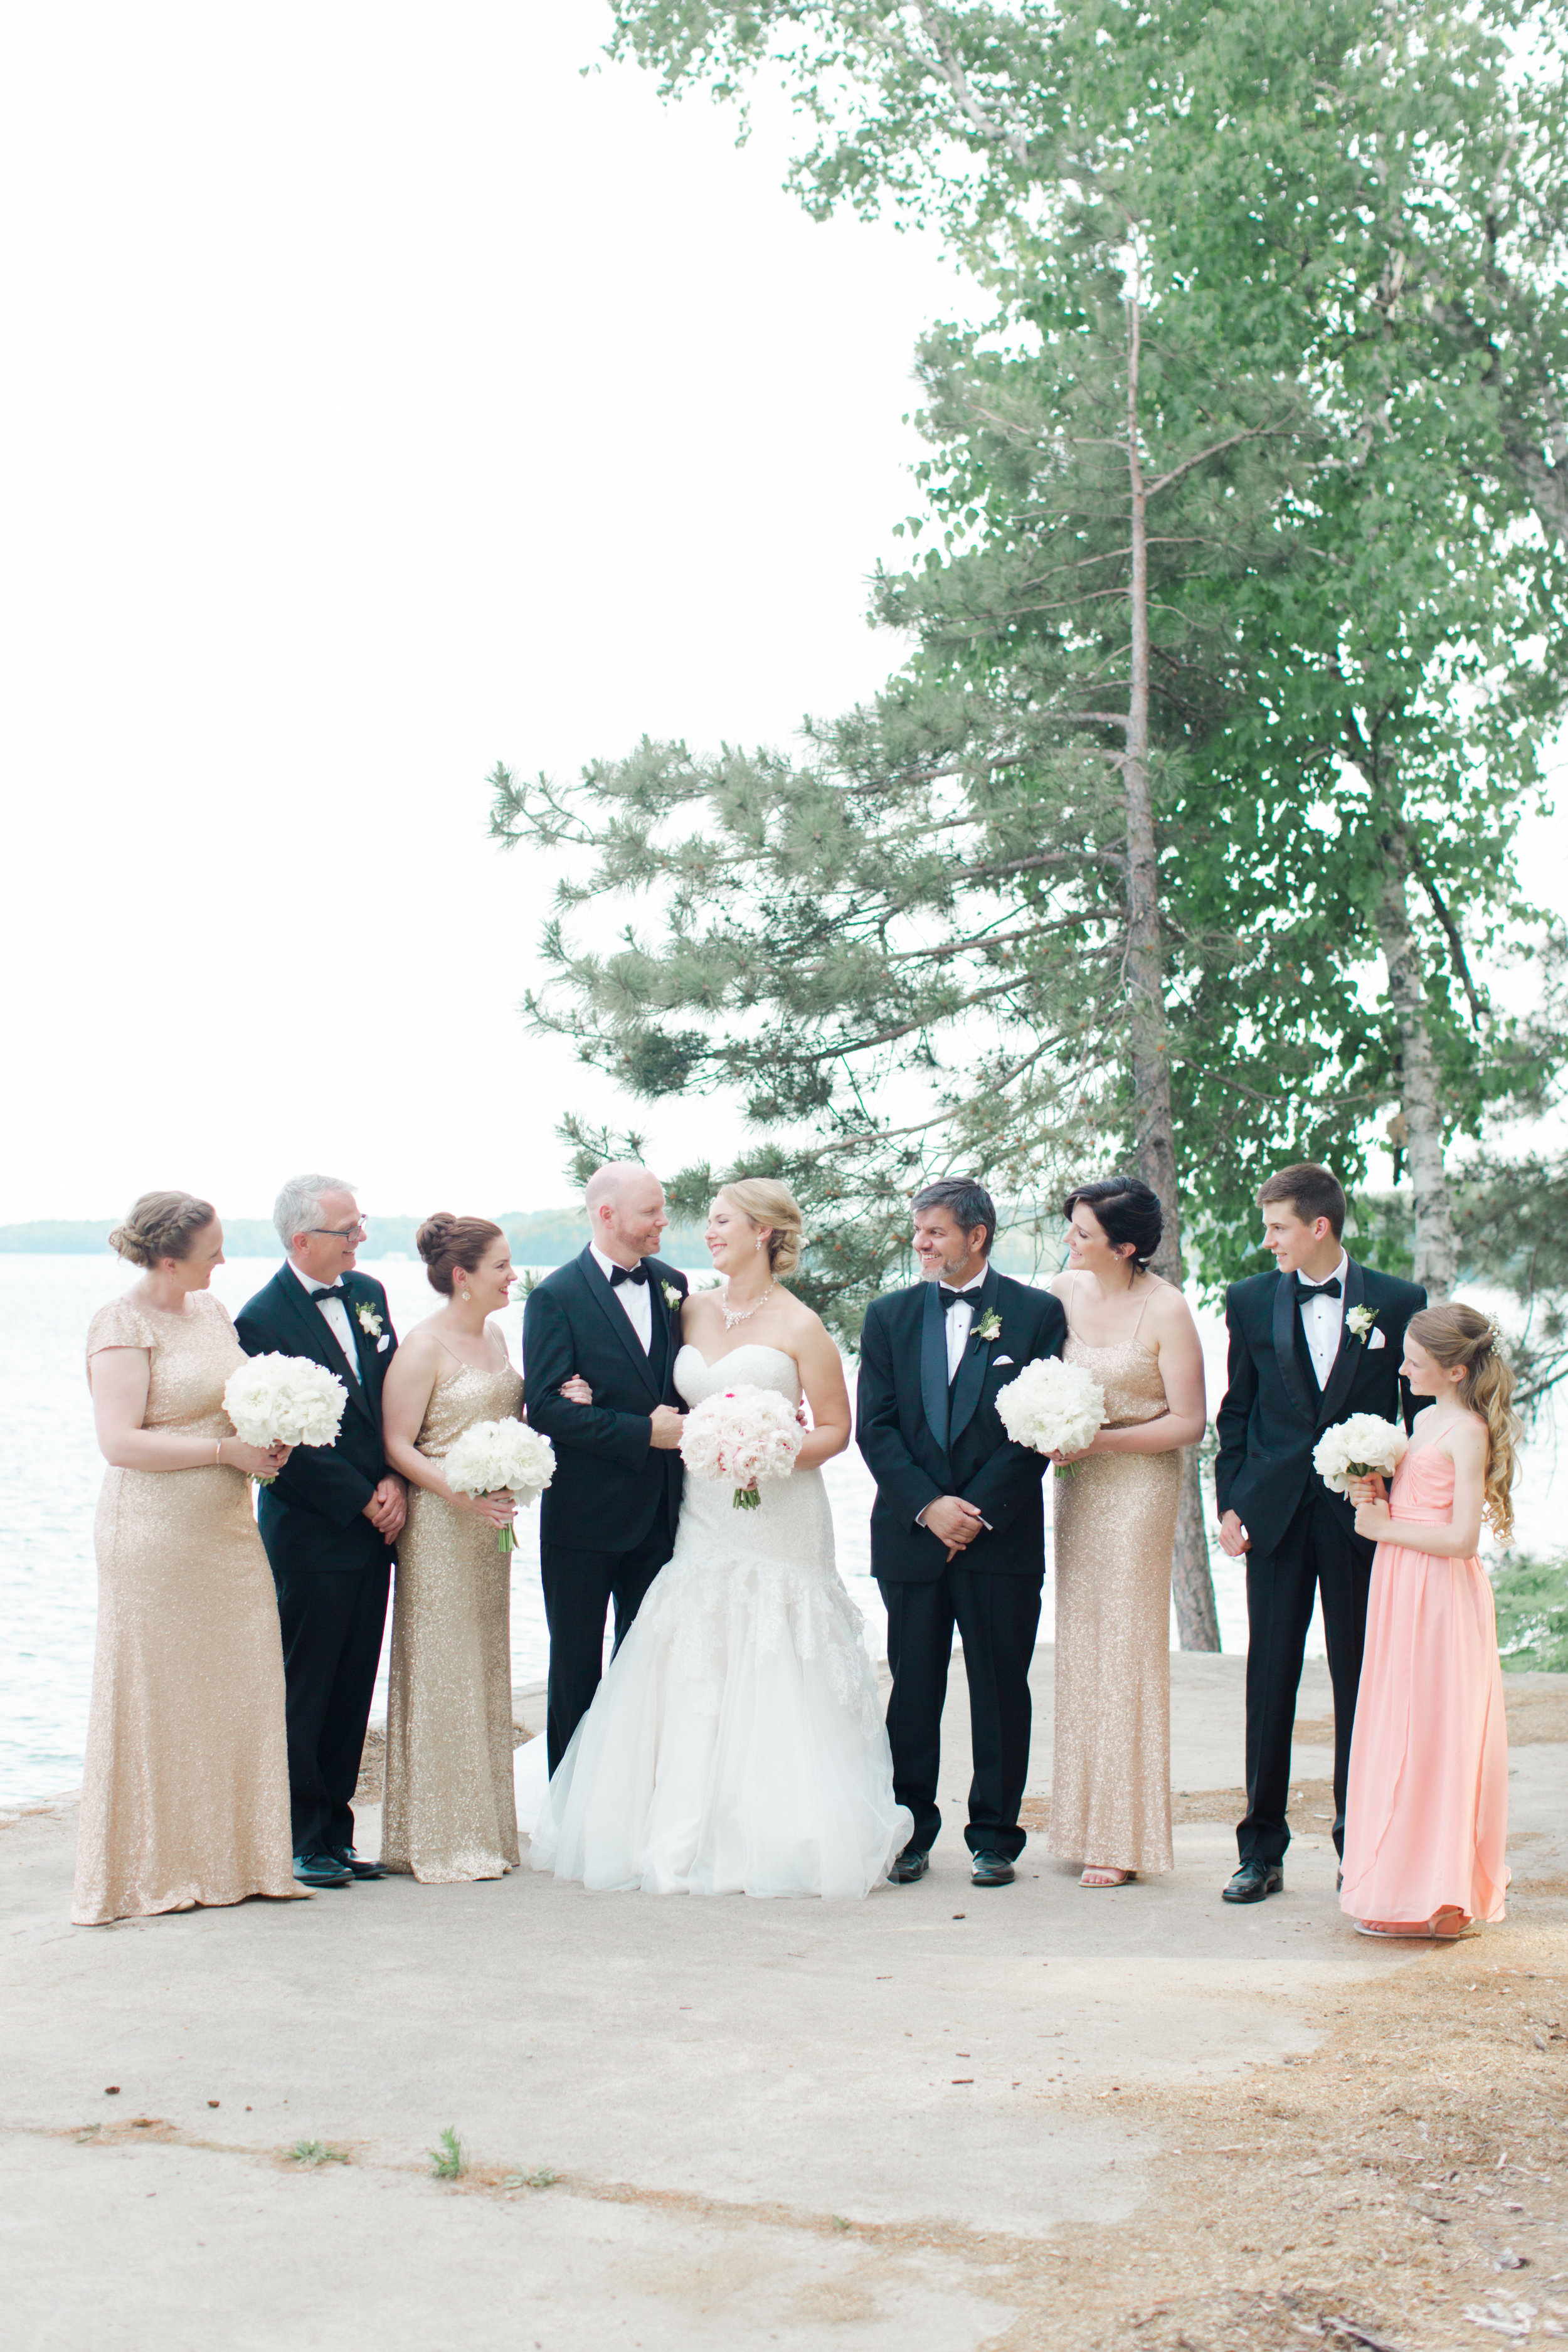 toronto-ontario-muskoka-rosseau-marriott-high-end-wedding-photographer-richelle-hunter-tori-doug-569.jpg